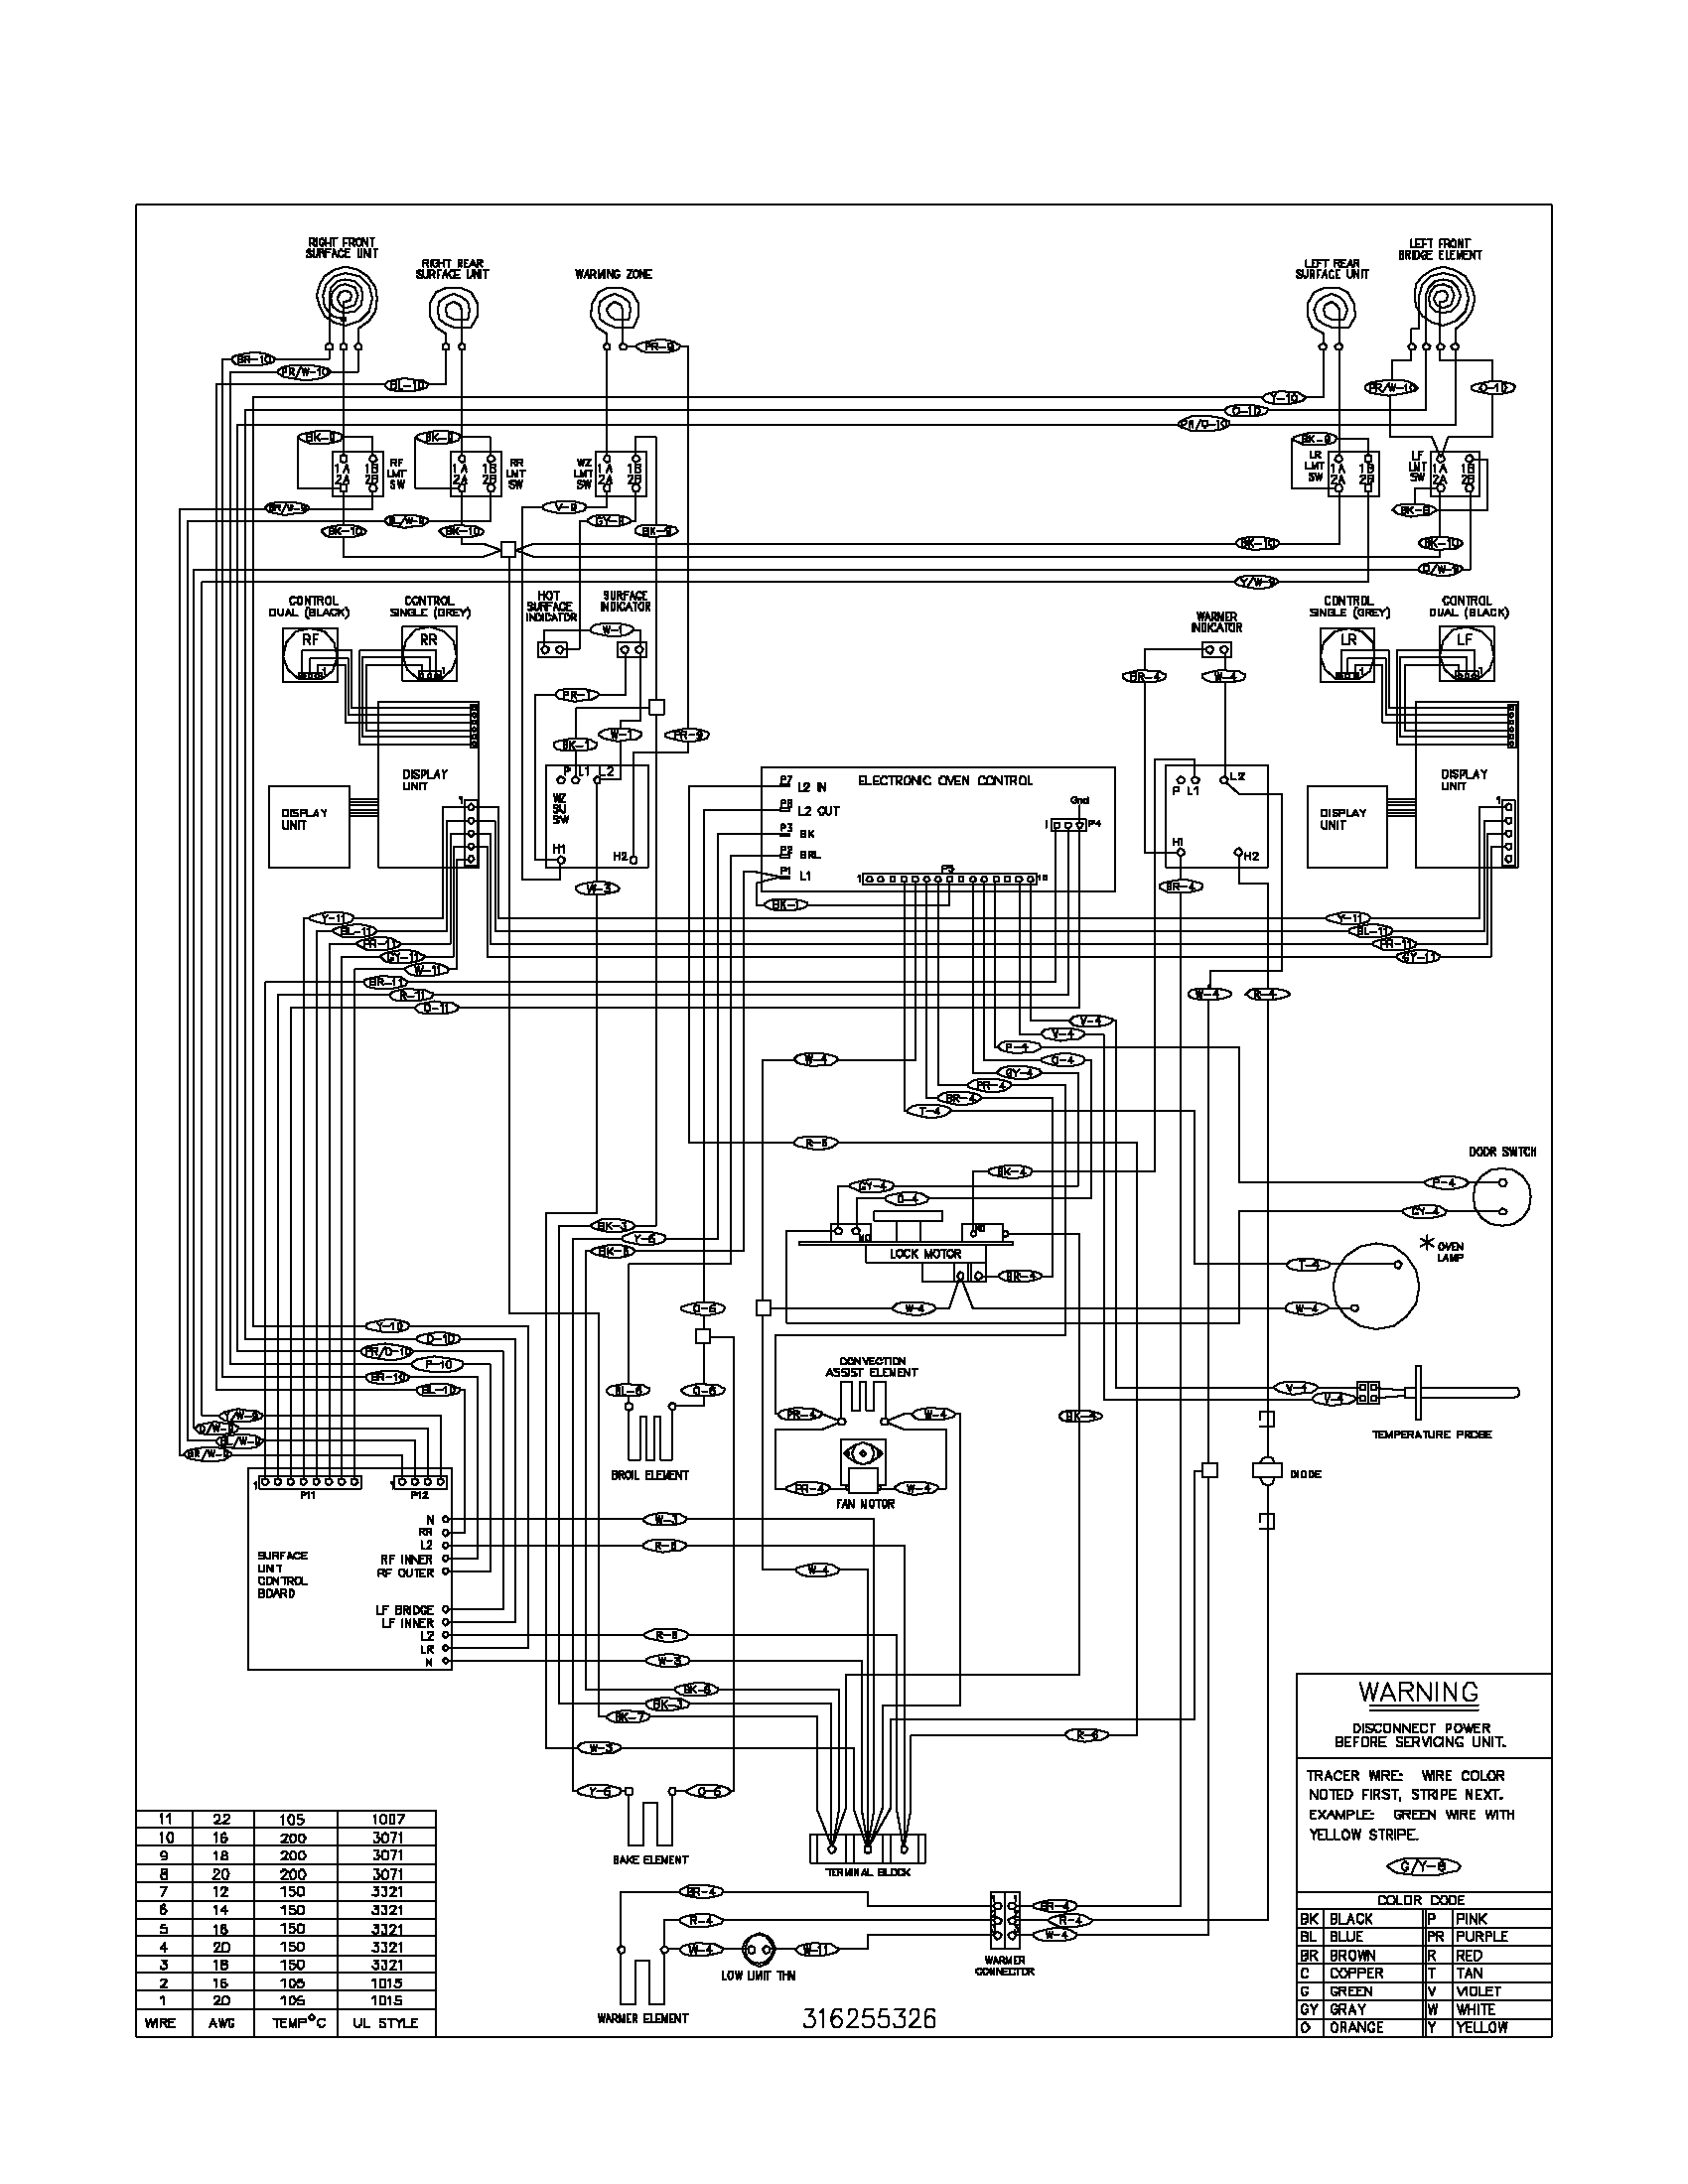 CA_1916] Electric Range Wiring Diagram Likewise Frigidaire Electric RangeIvoro Vira Mohammedshrine Librar Wiring 101